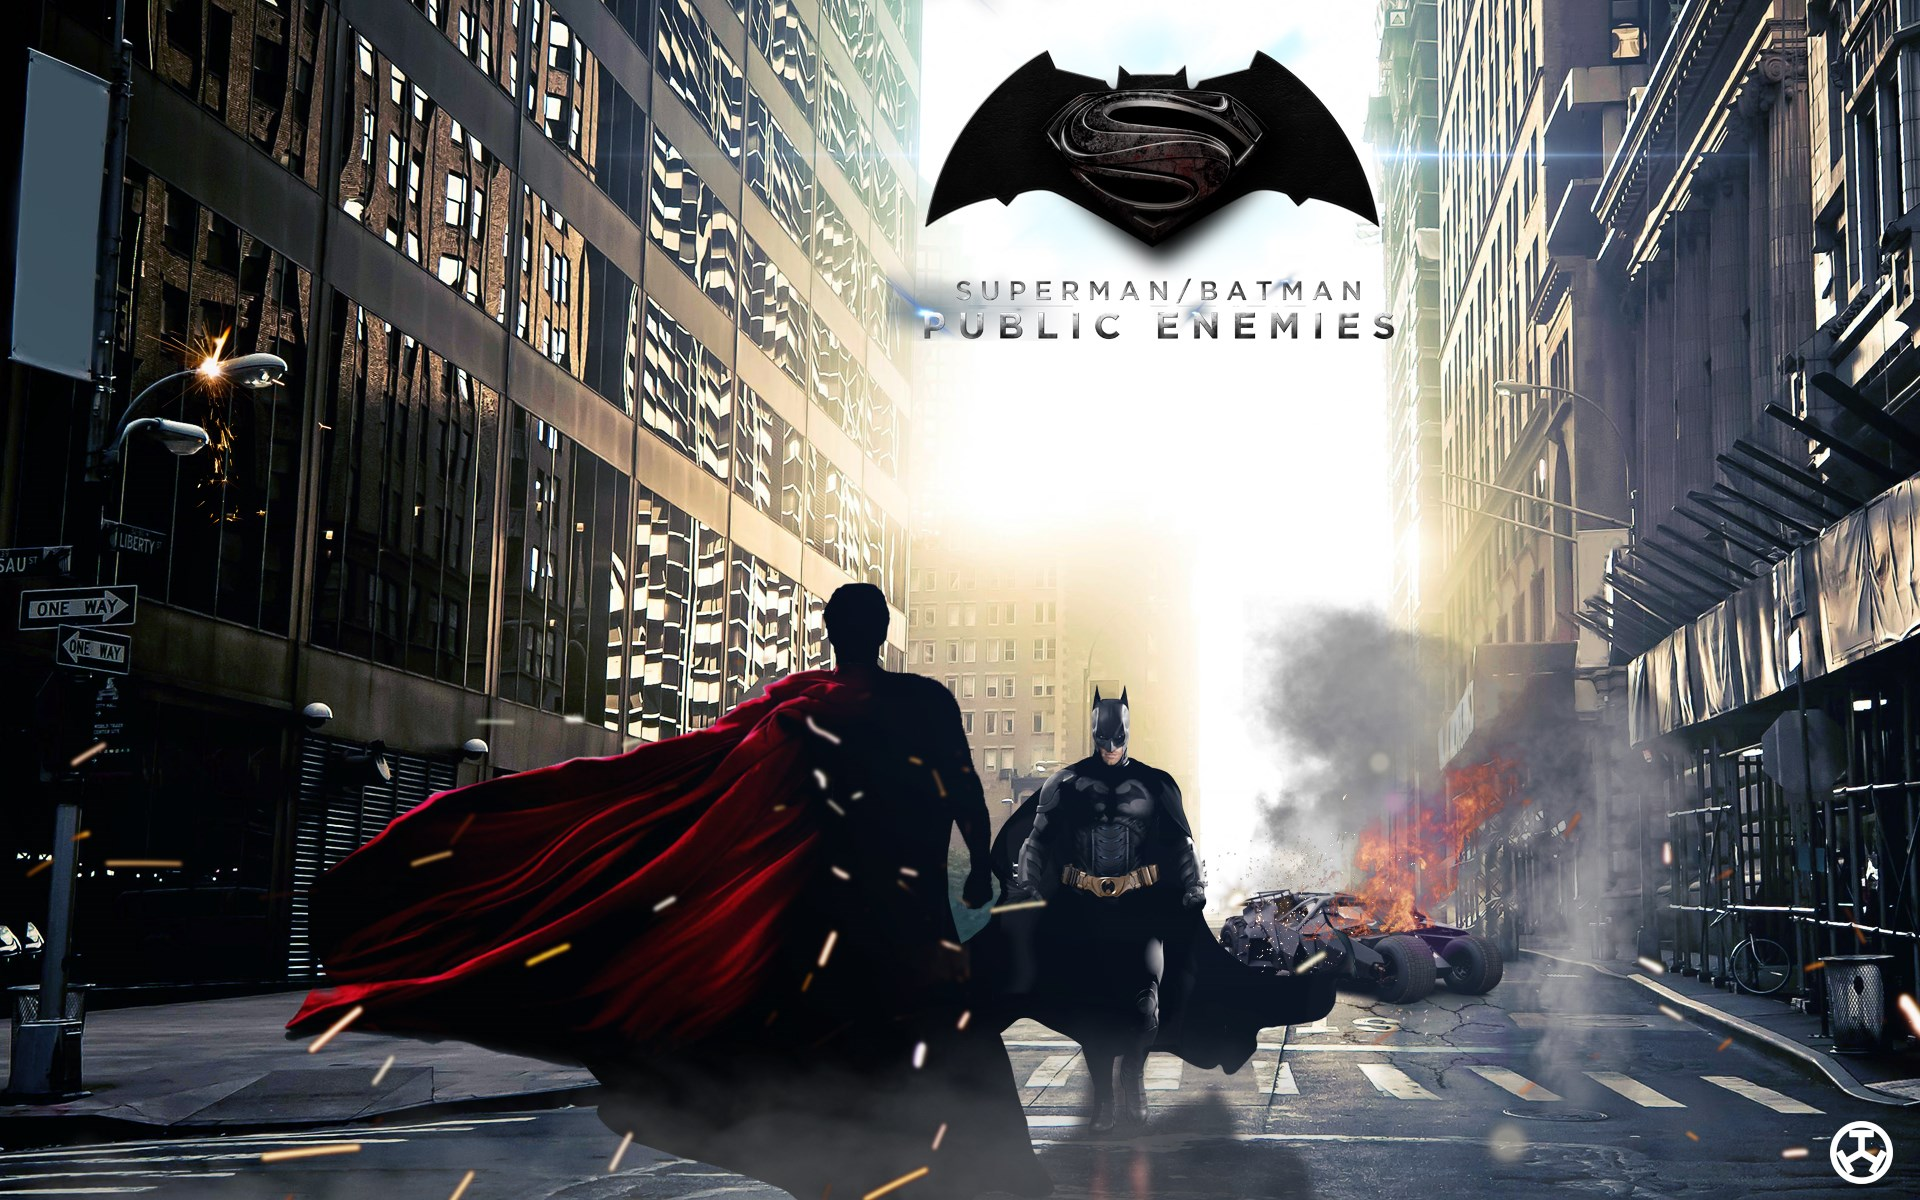 batman vs superman movie wallpaper 1920x1200 geekstrokecom 1920x1200